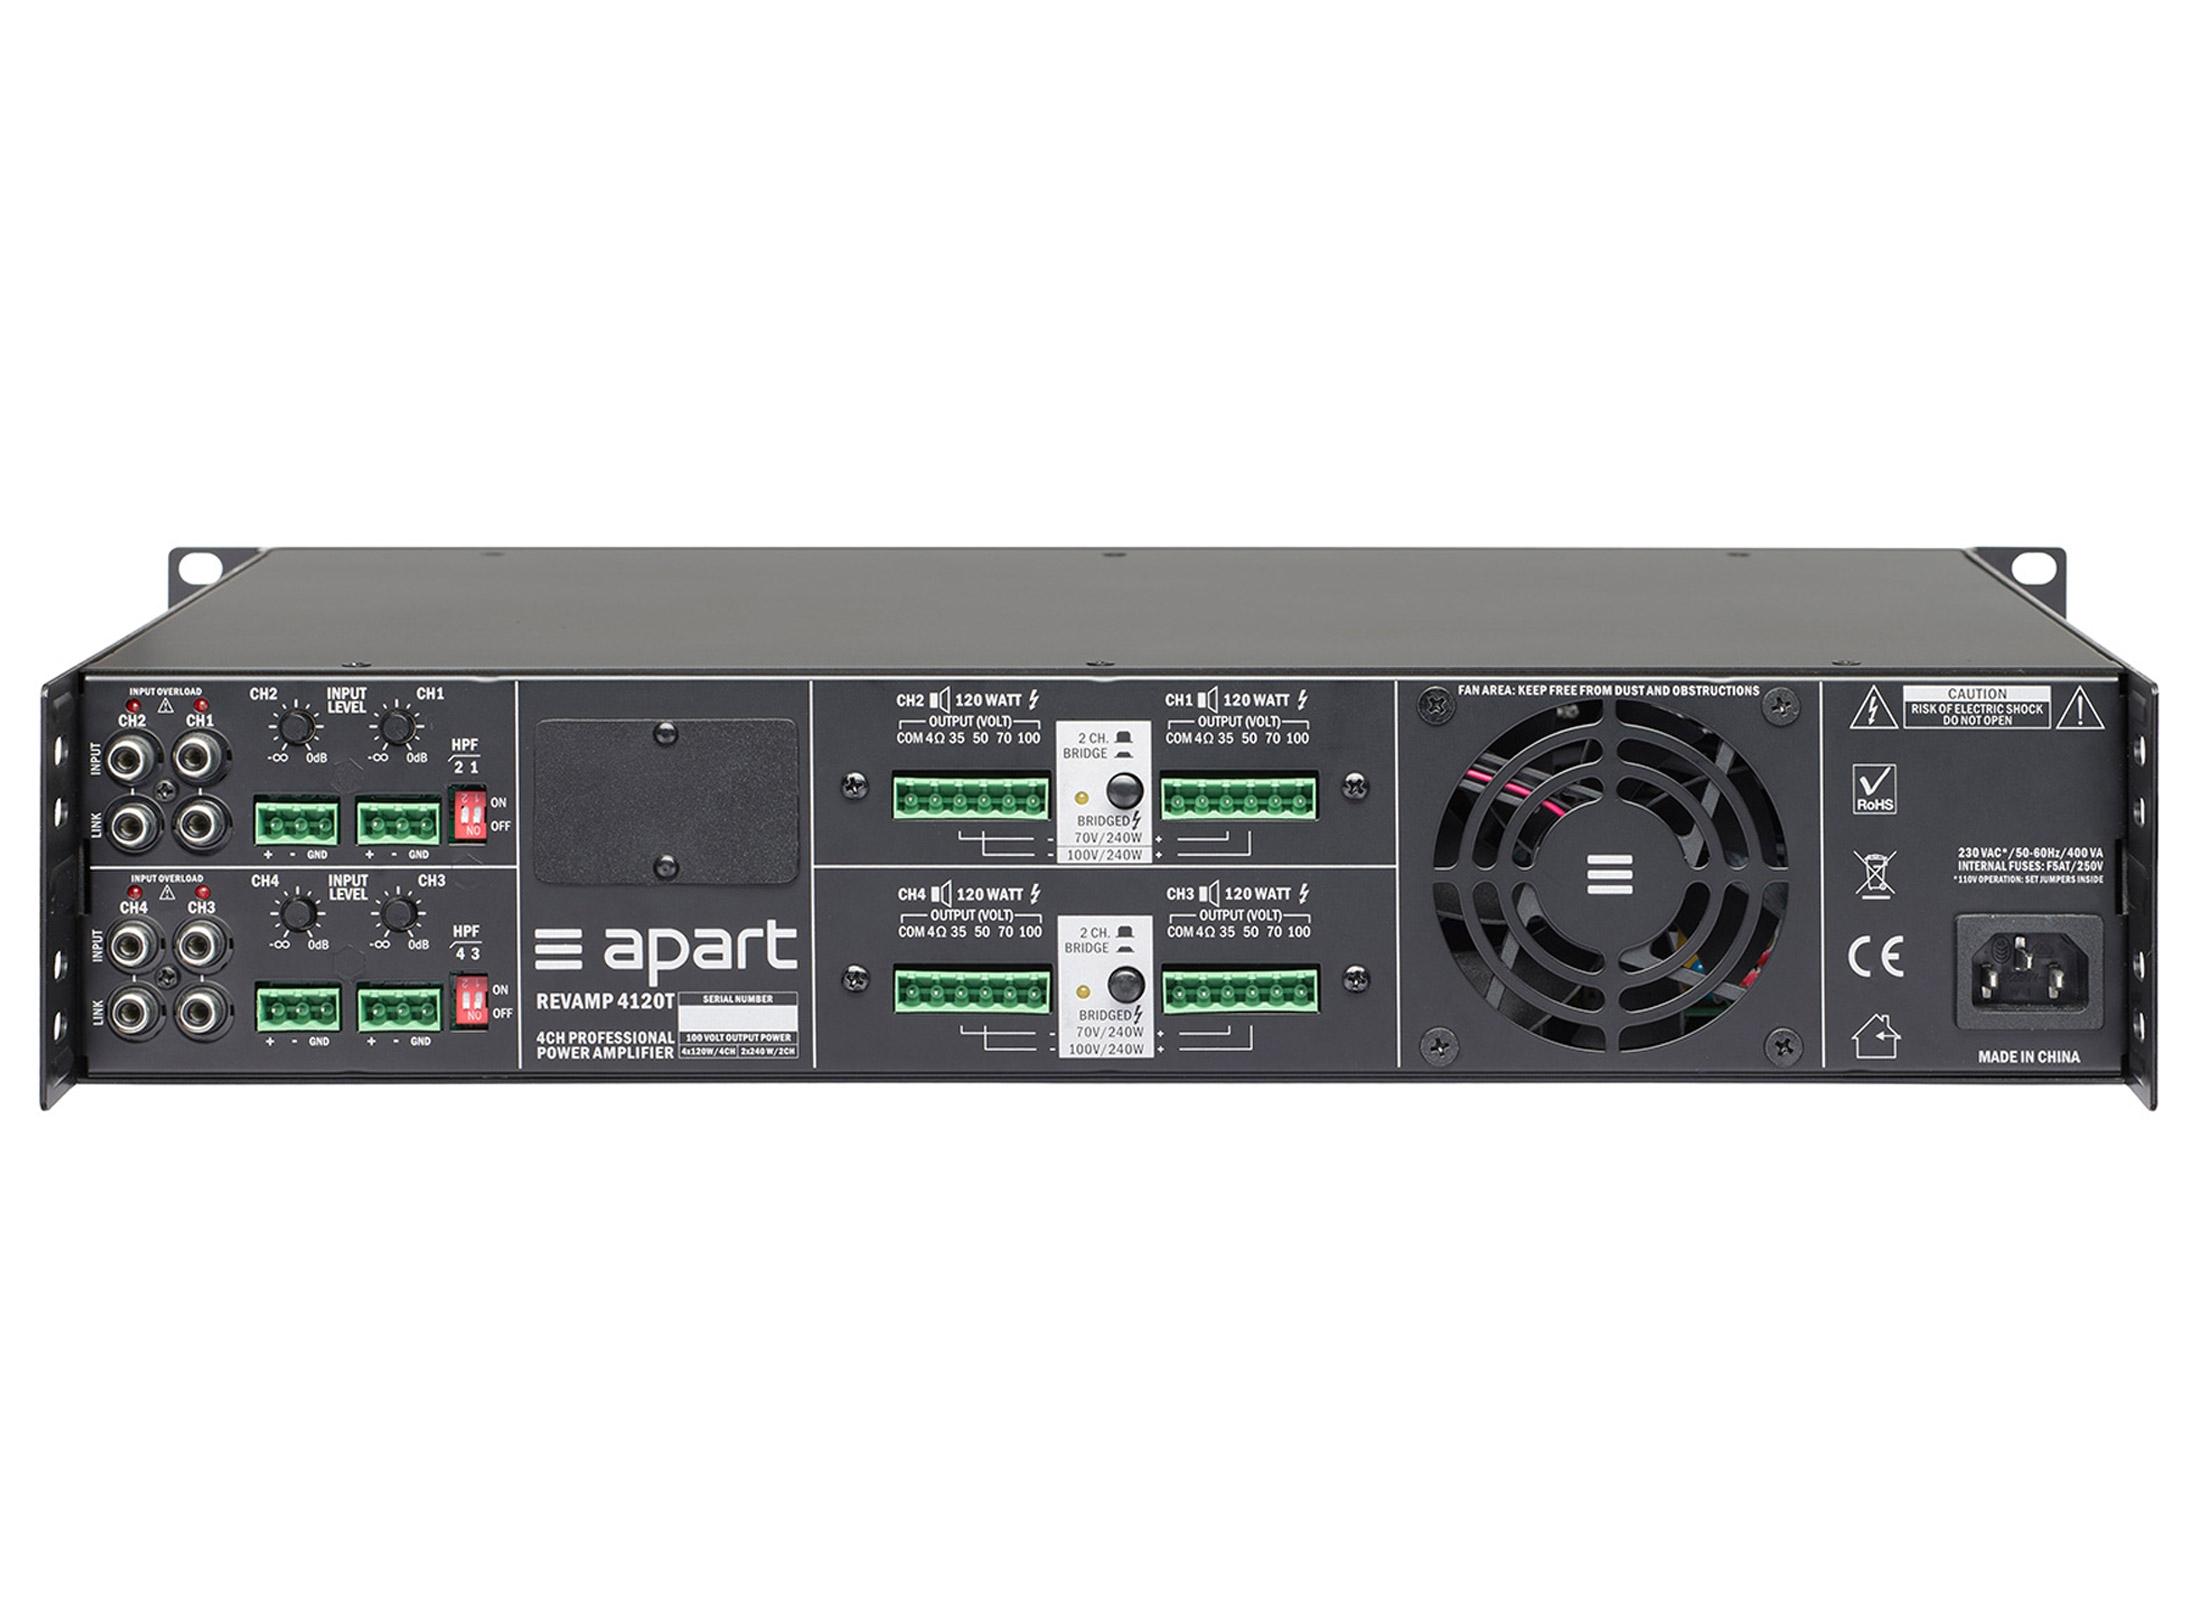 Apart Audio Revamp2250 Digital Endstufe Online At Low Prices Huss 50 Watts Power Amplifier 2